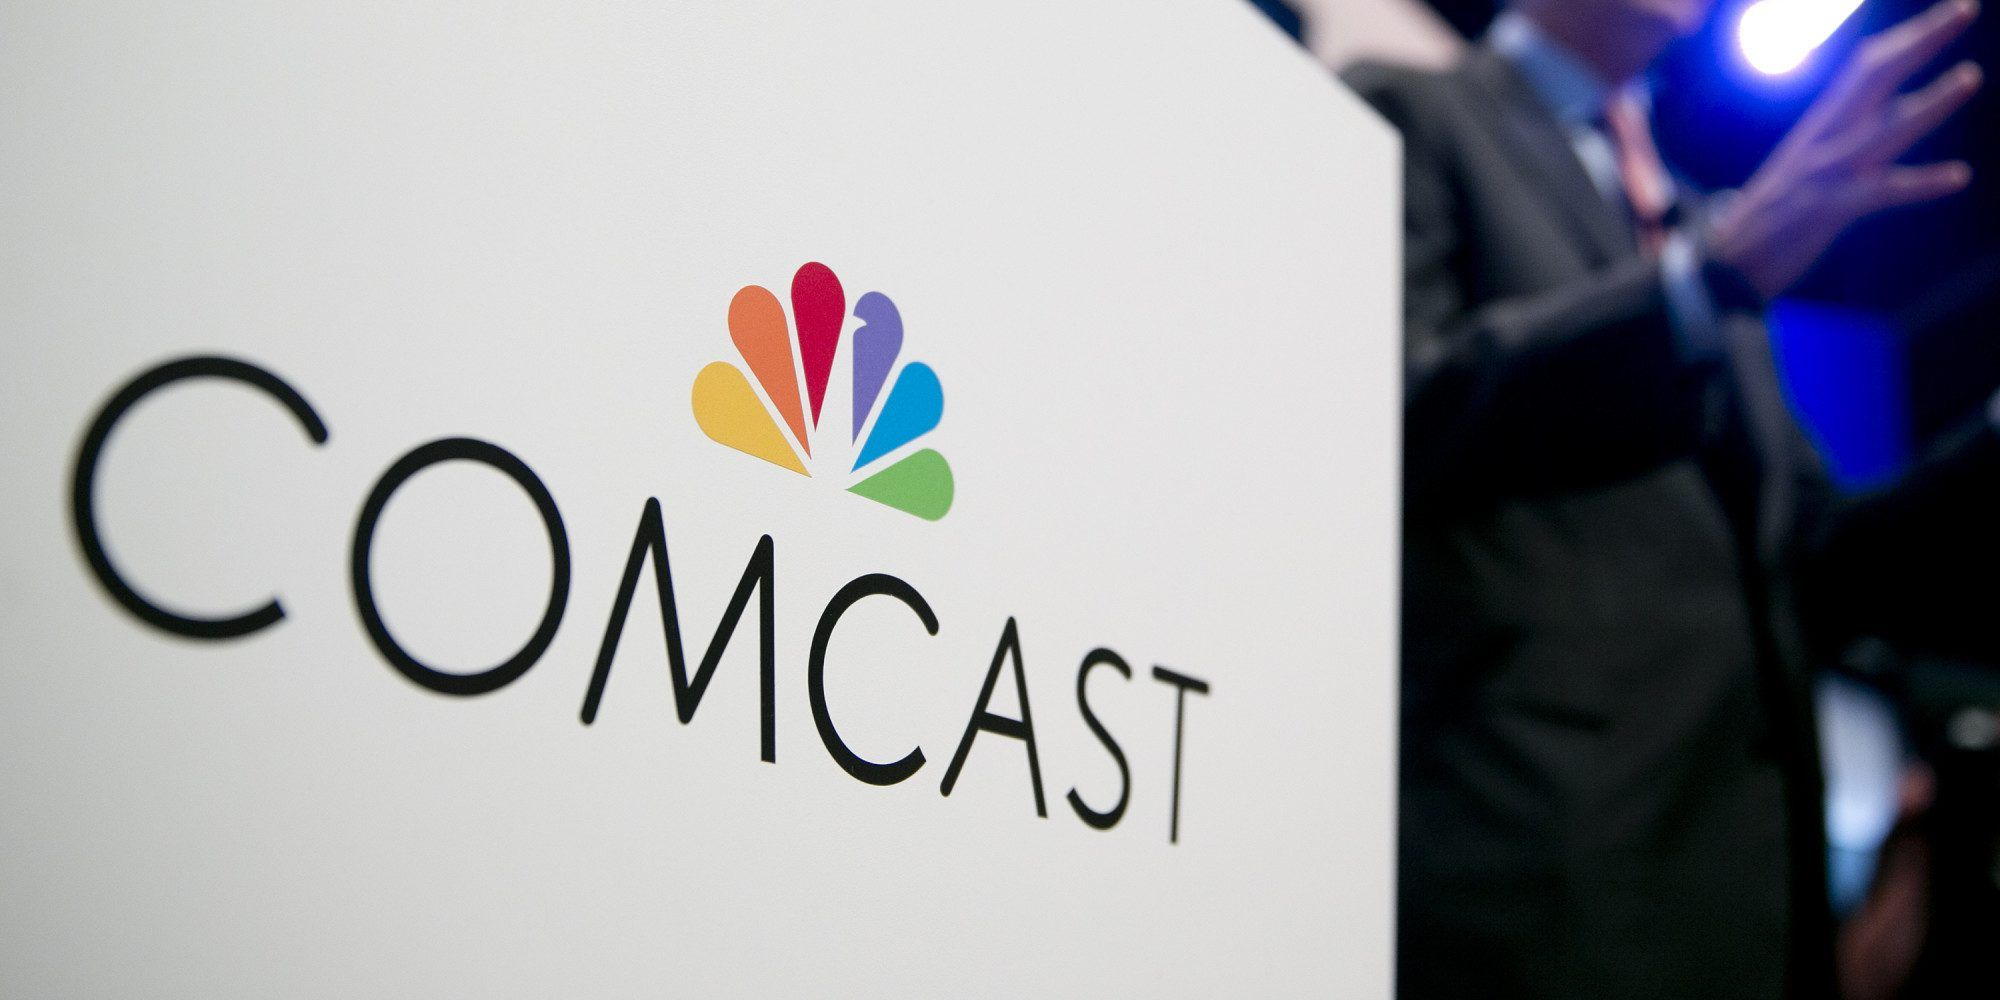 Comcast entering wireless market w/ unlimited data, talk